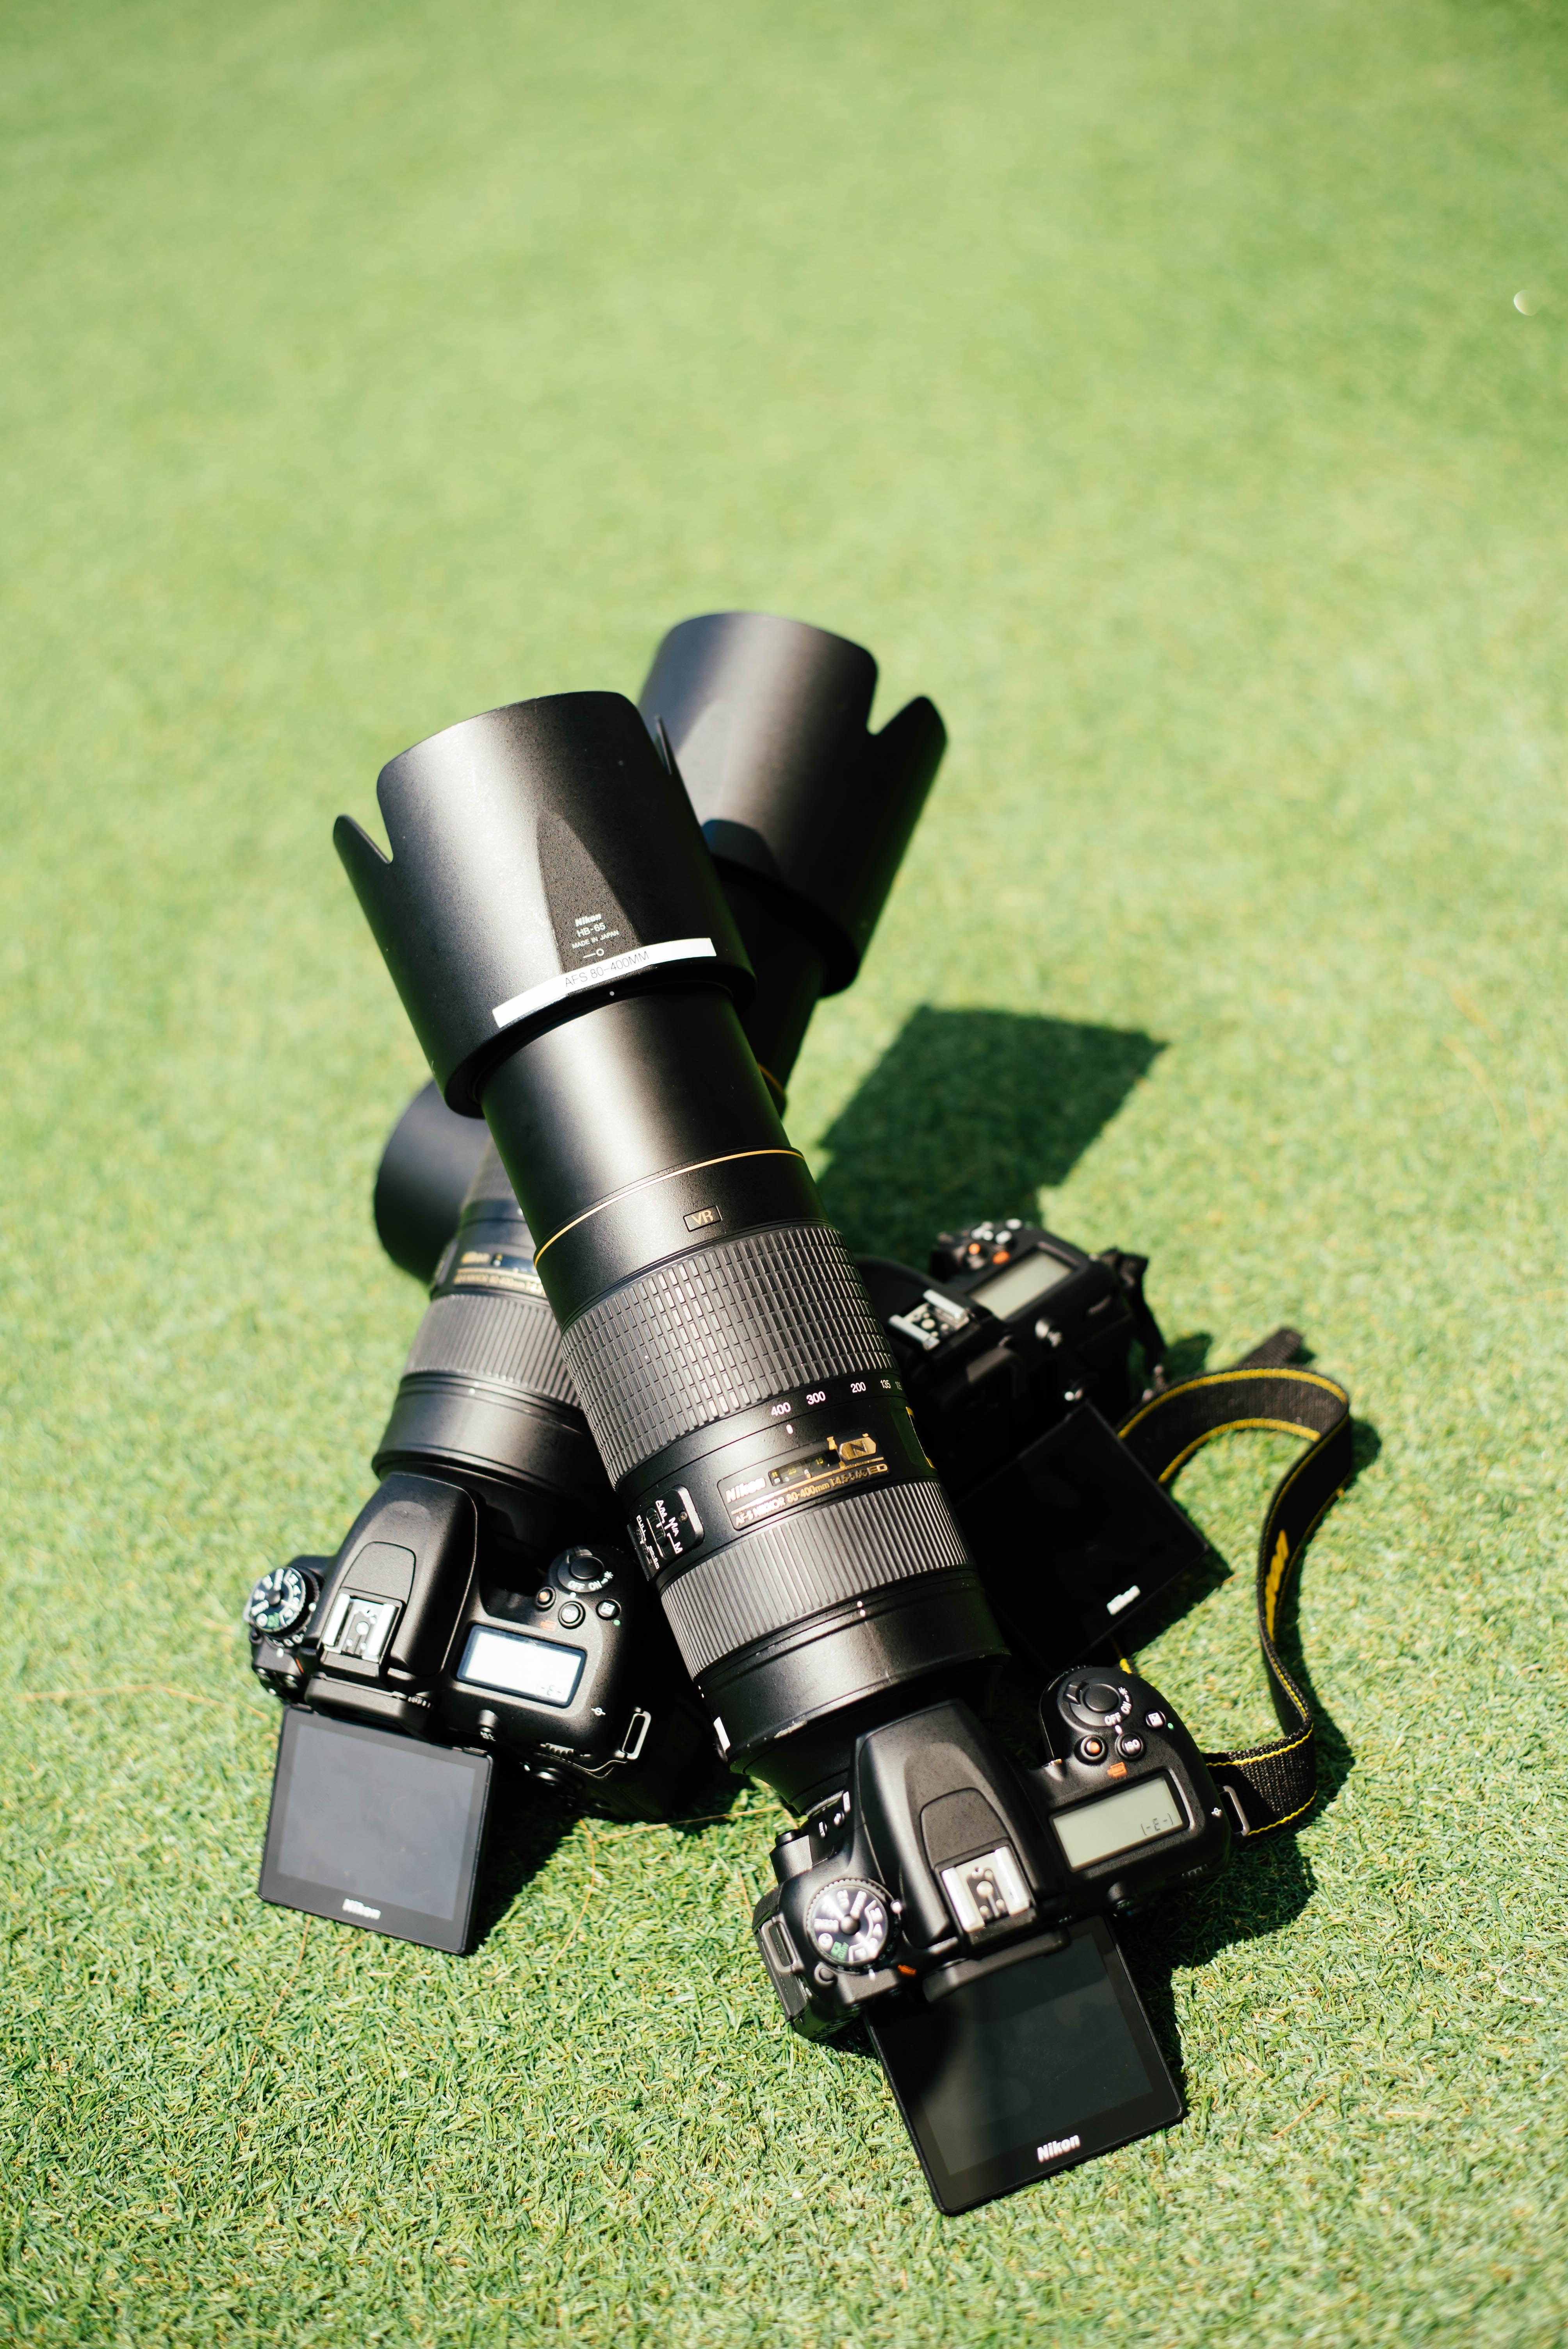 Camera with big lenses